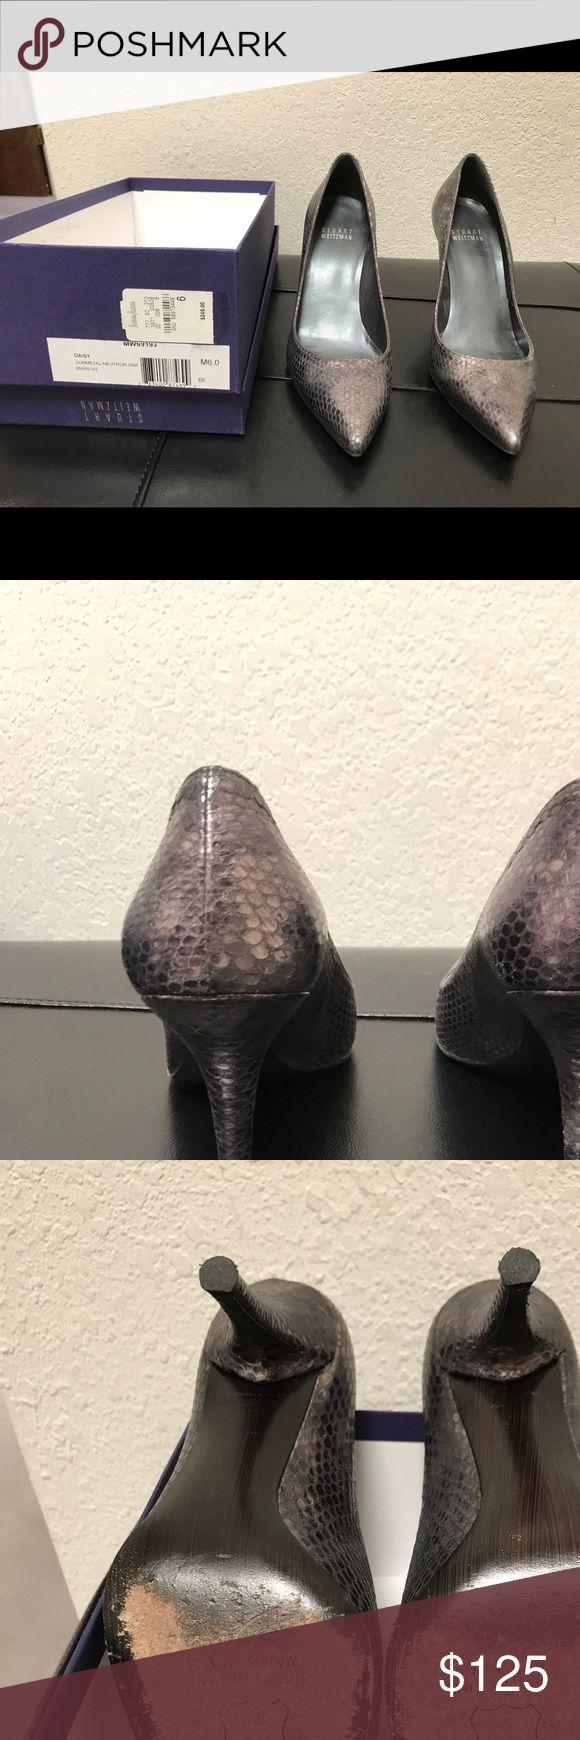 Cole Haan Daisy gunmetal snakeskin heels Cole Haan Daisy gunmetal snakeskin heels.  3in. heel. Cole Haan Shoes Heels